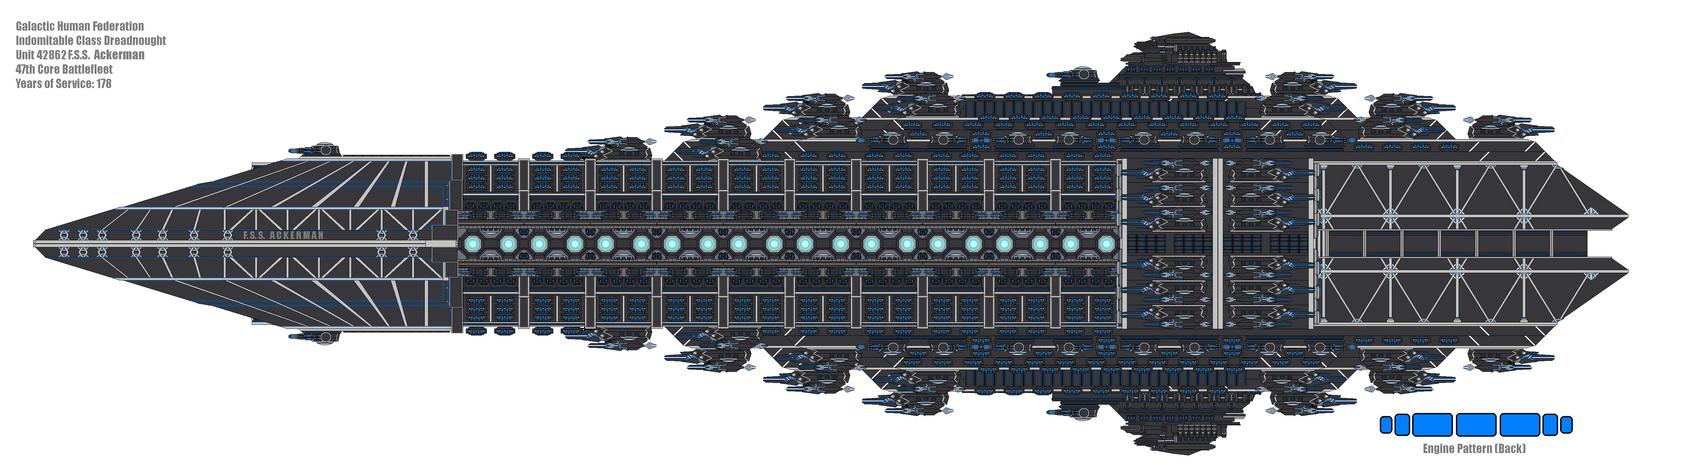 DAOT Indomitable class Bravo Configuration